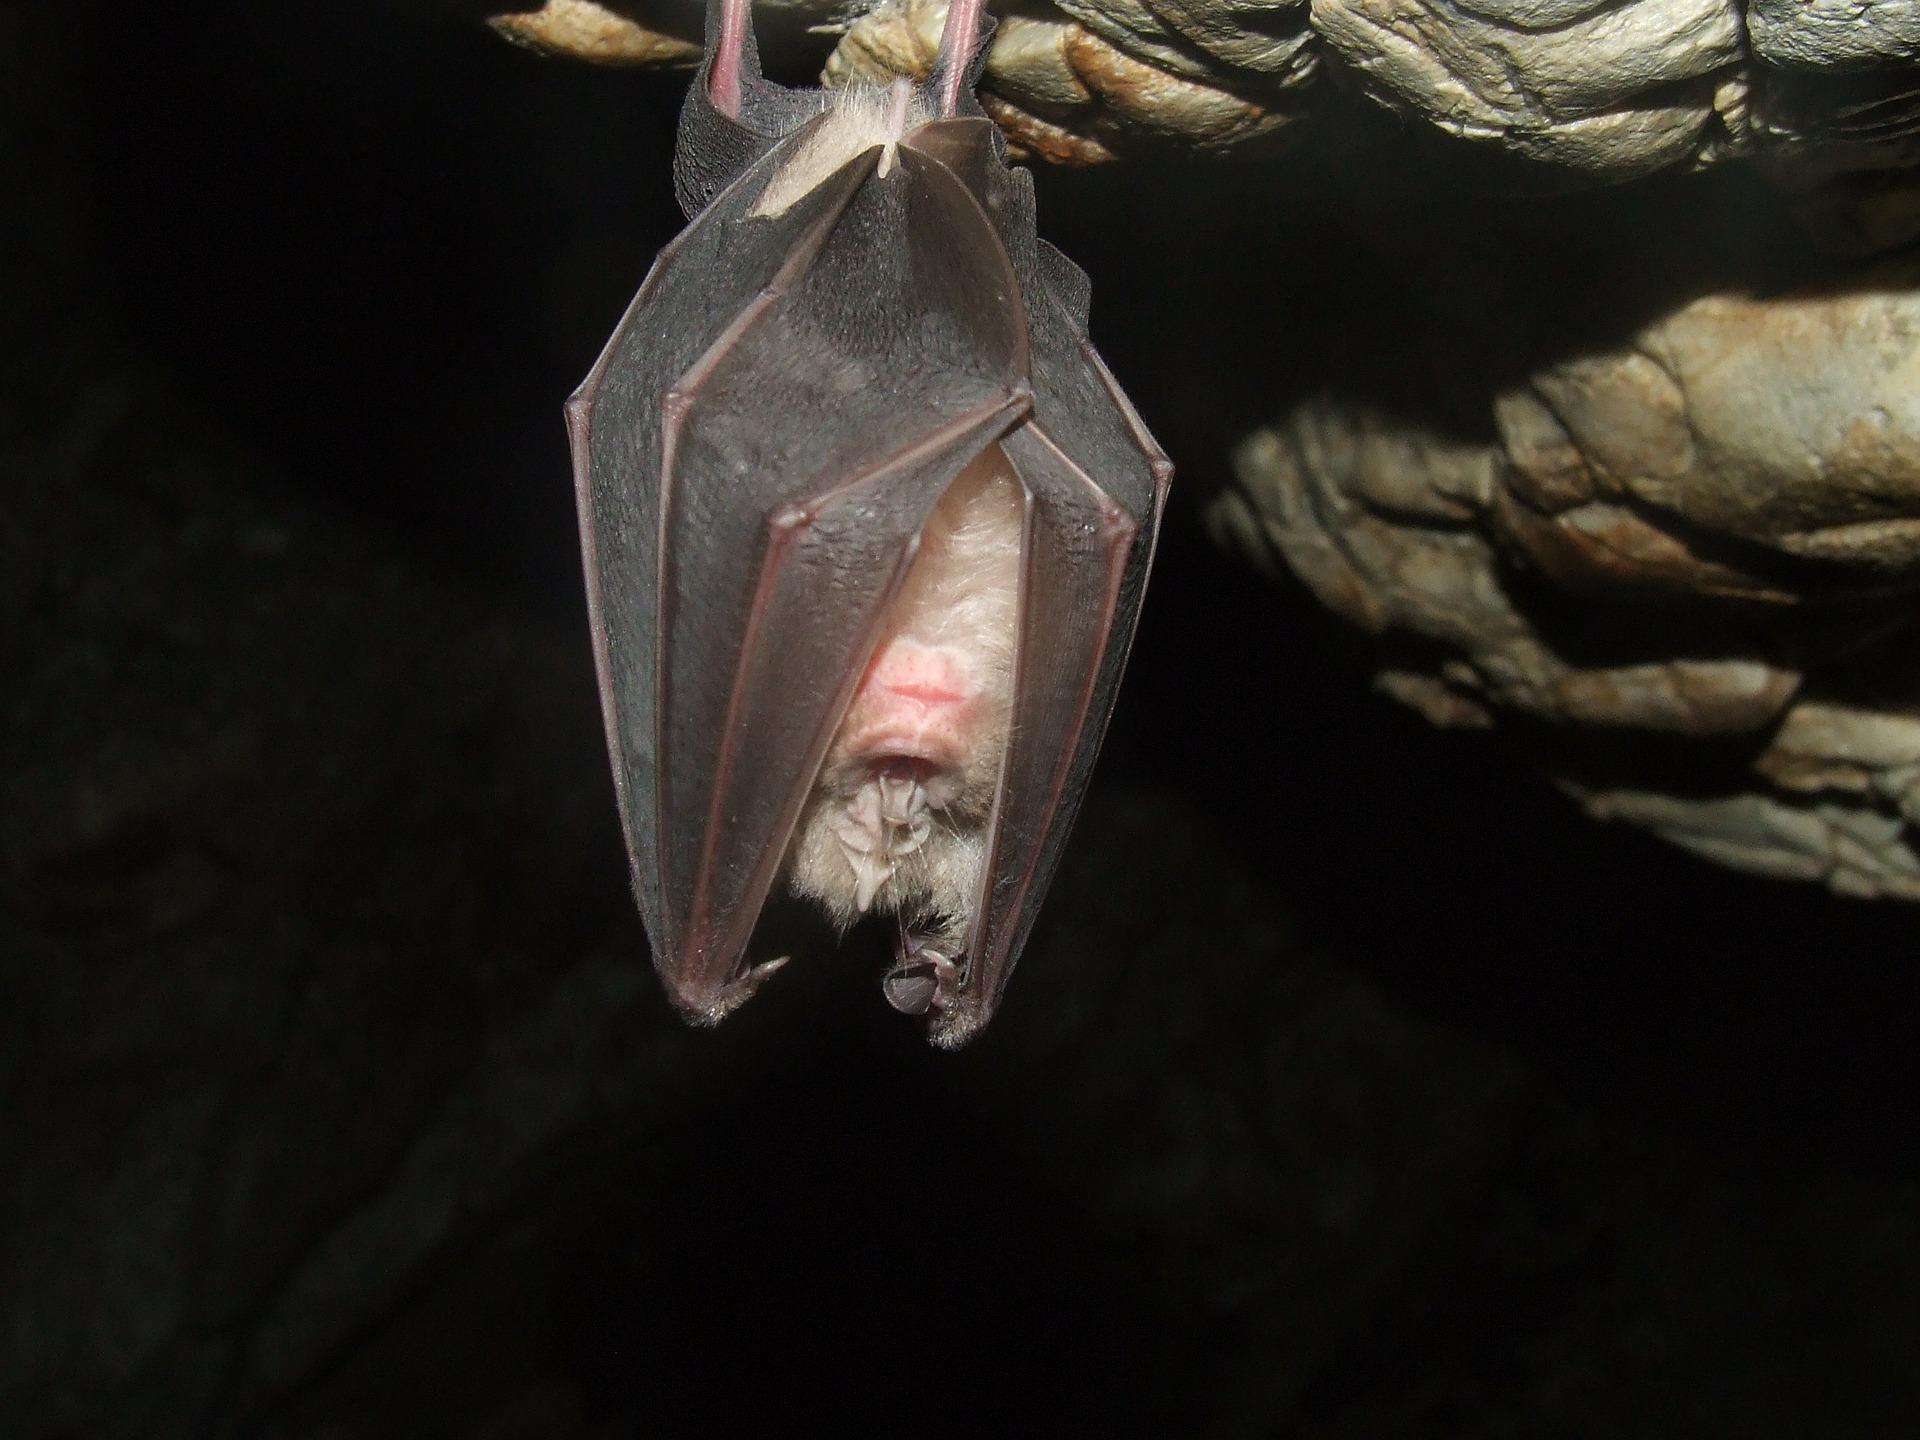 Fledermaus - bat